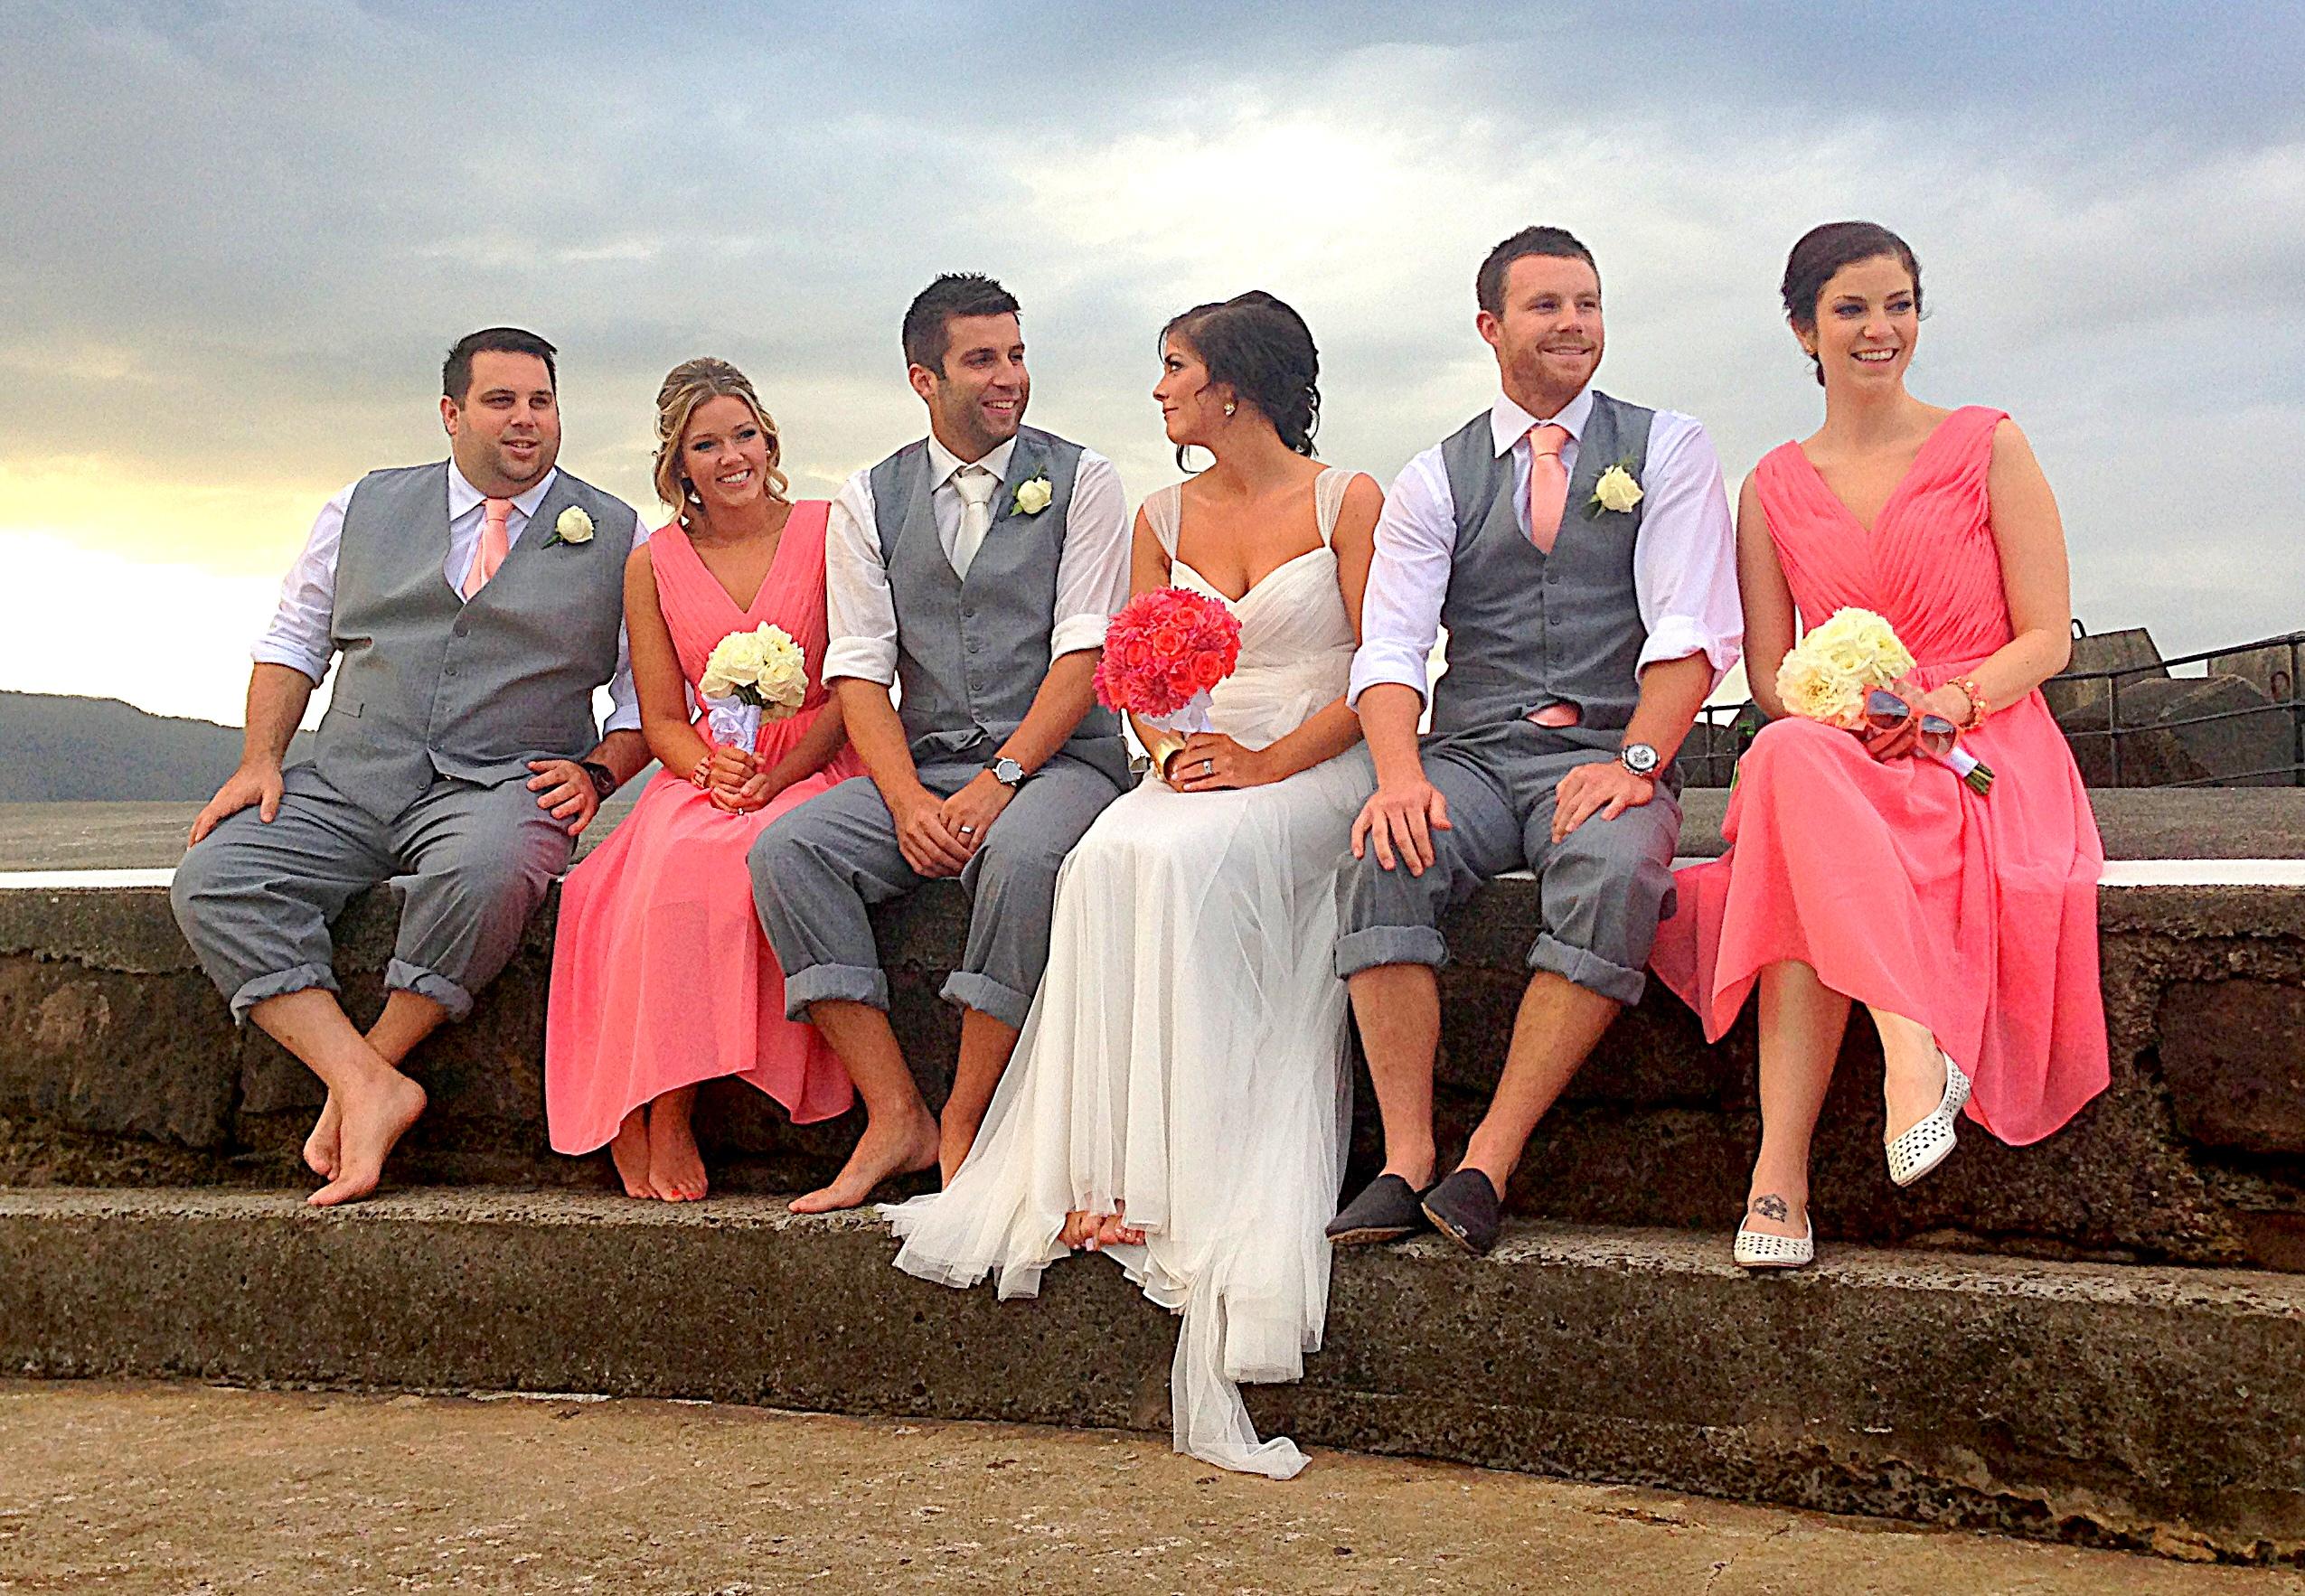 Sydney, Australia: Britt's Australian Wedding Ceremony